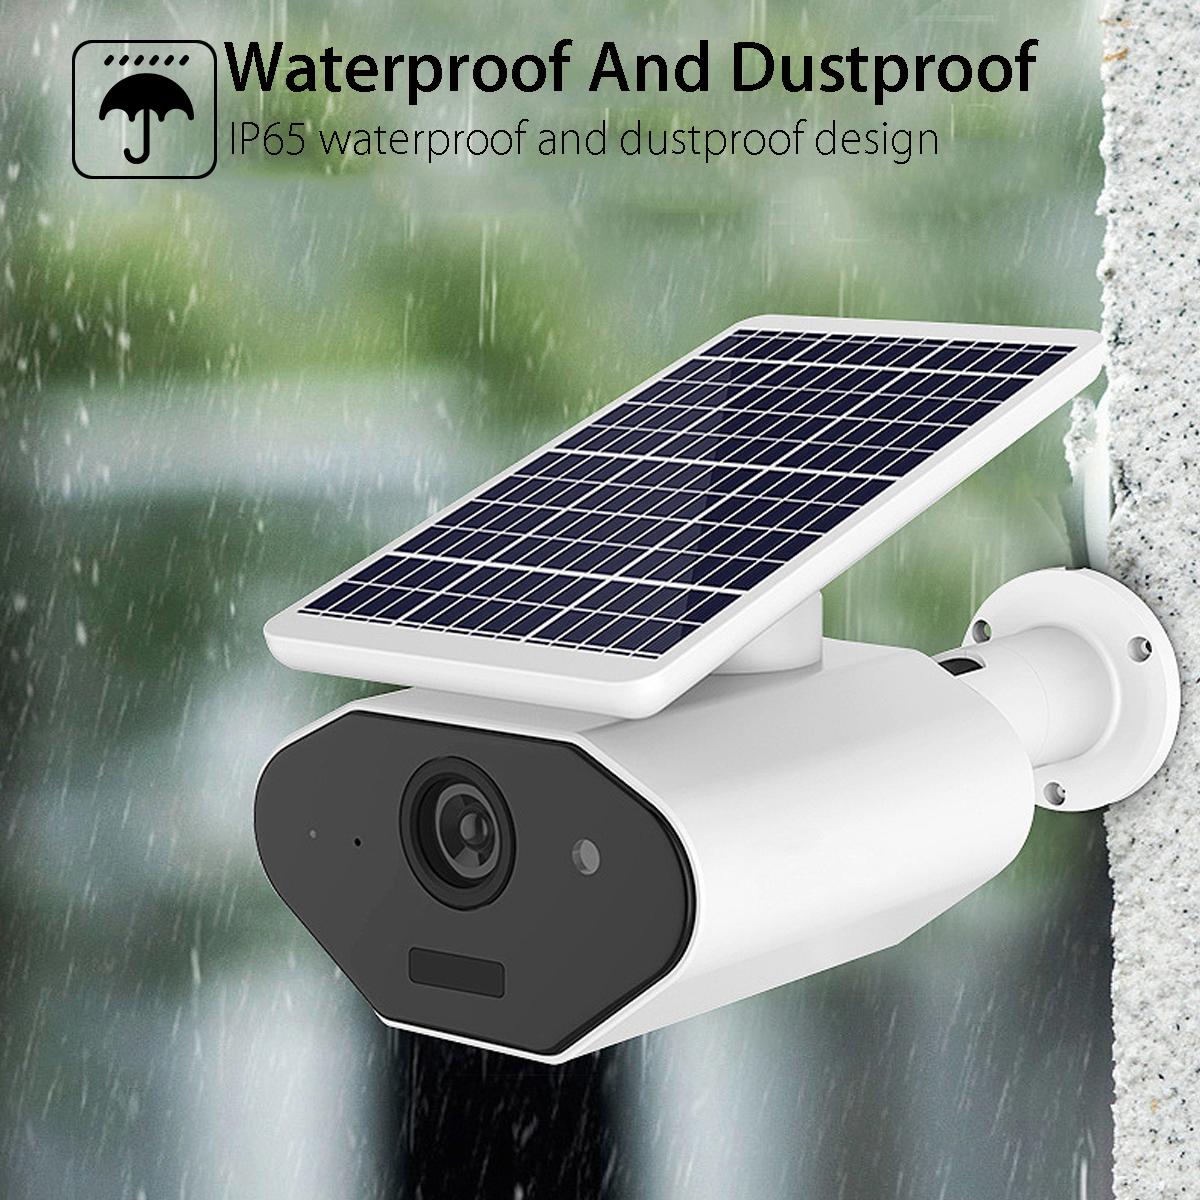 Solar Powered Wireless WiFi 1080P IP Camera Waterproof 143° Angle Night Vesion Two Way Intercom